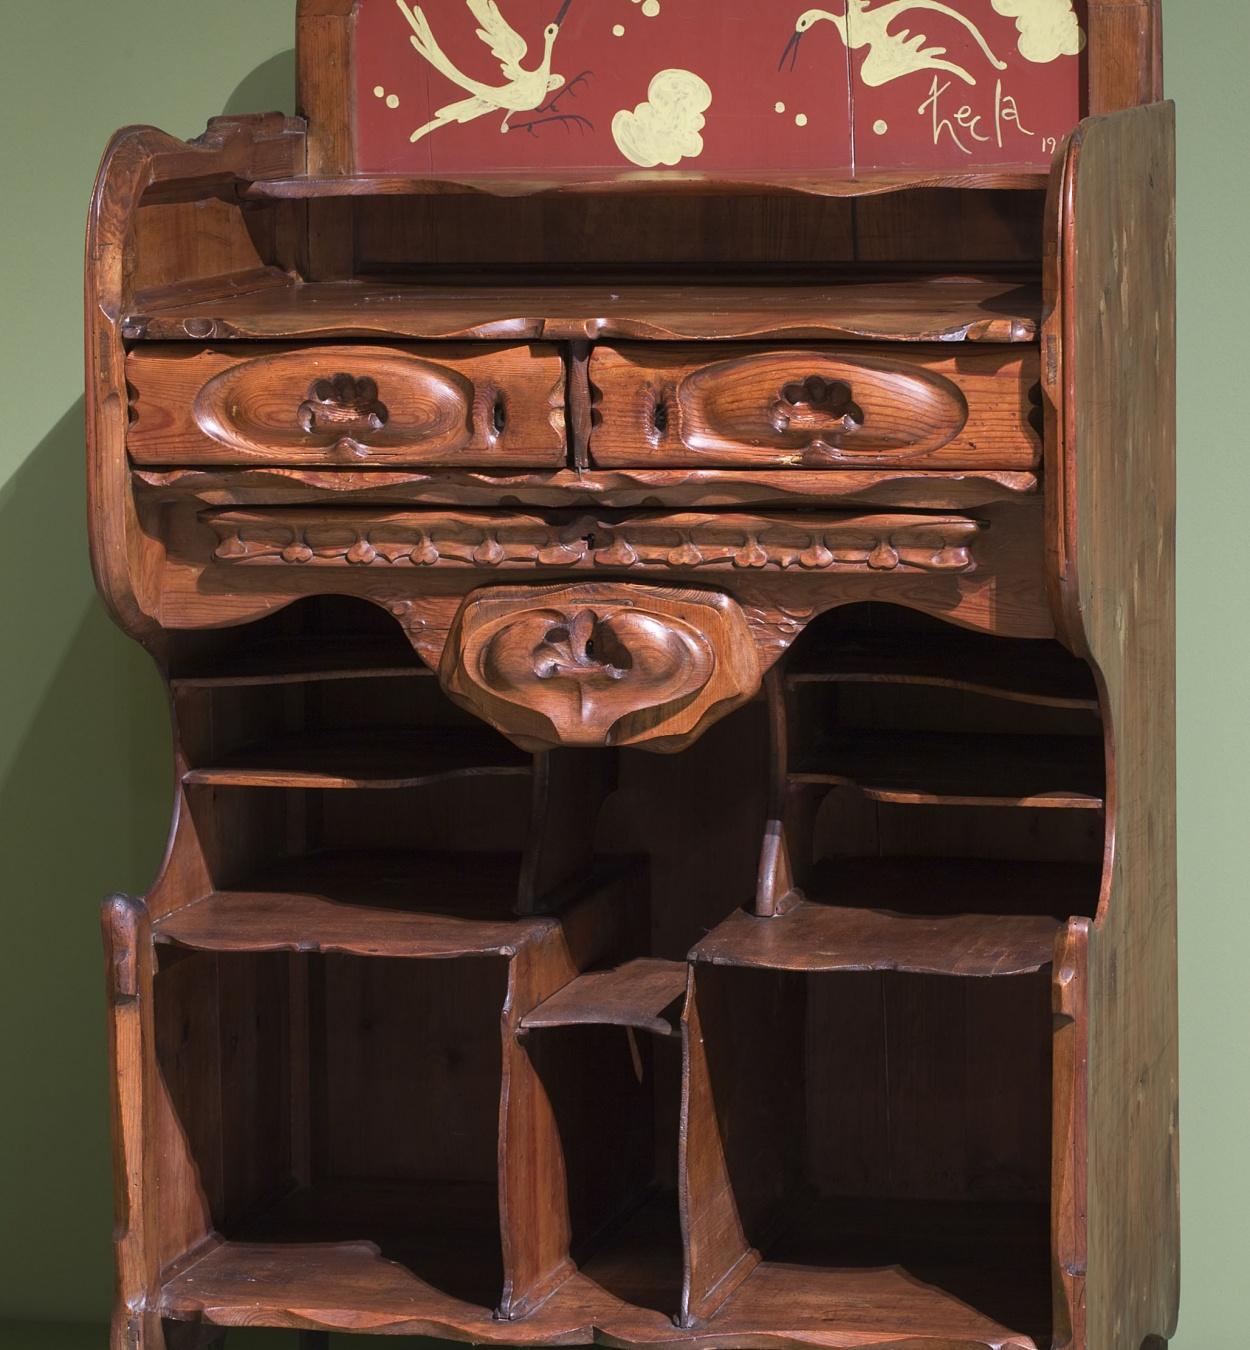 Josep Maria Jujol - Auxiliary office furniture - 1910